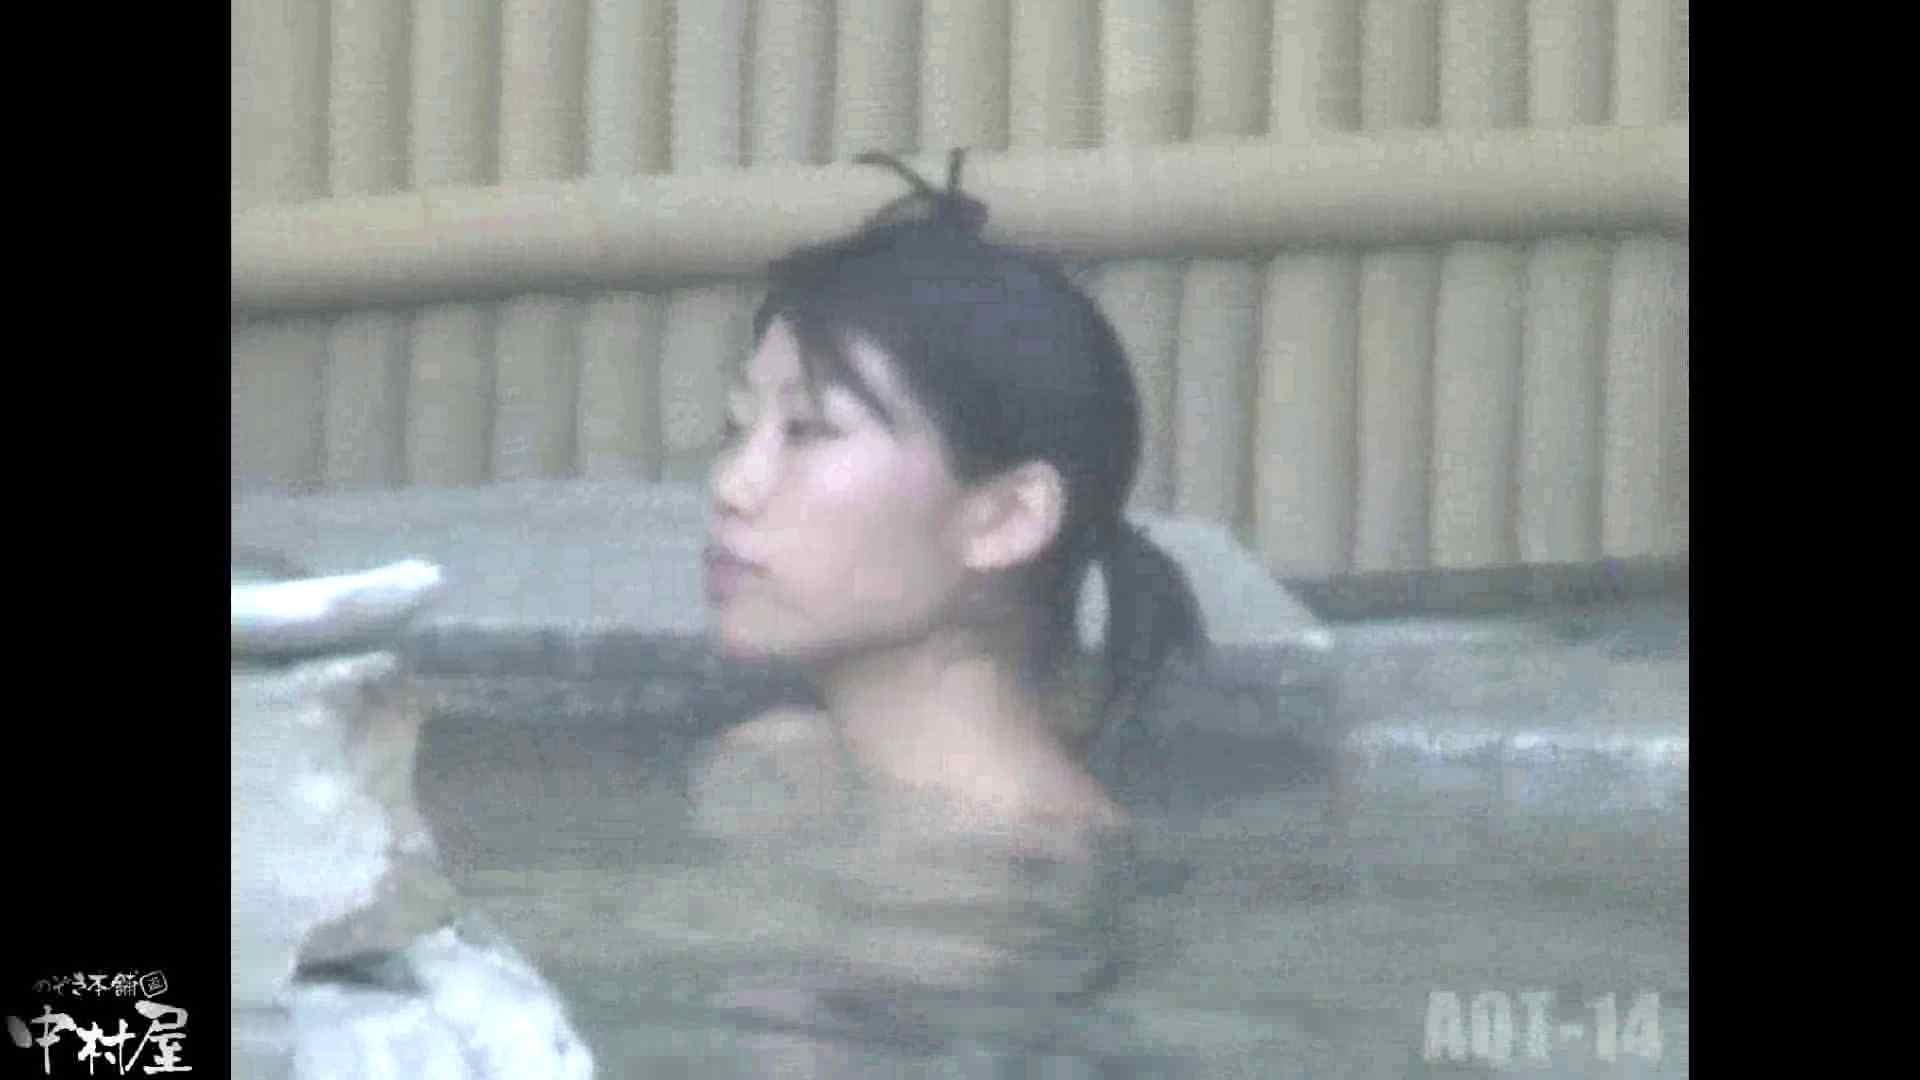 Aquaな露天風呂Vol.878潜入盗撮露天風呂十四判湯 其の一 潜入画像   露天  59画像 56